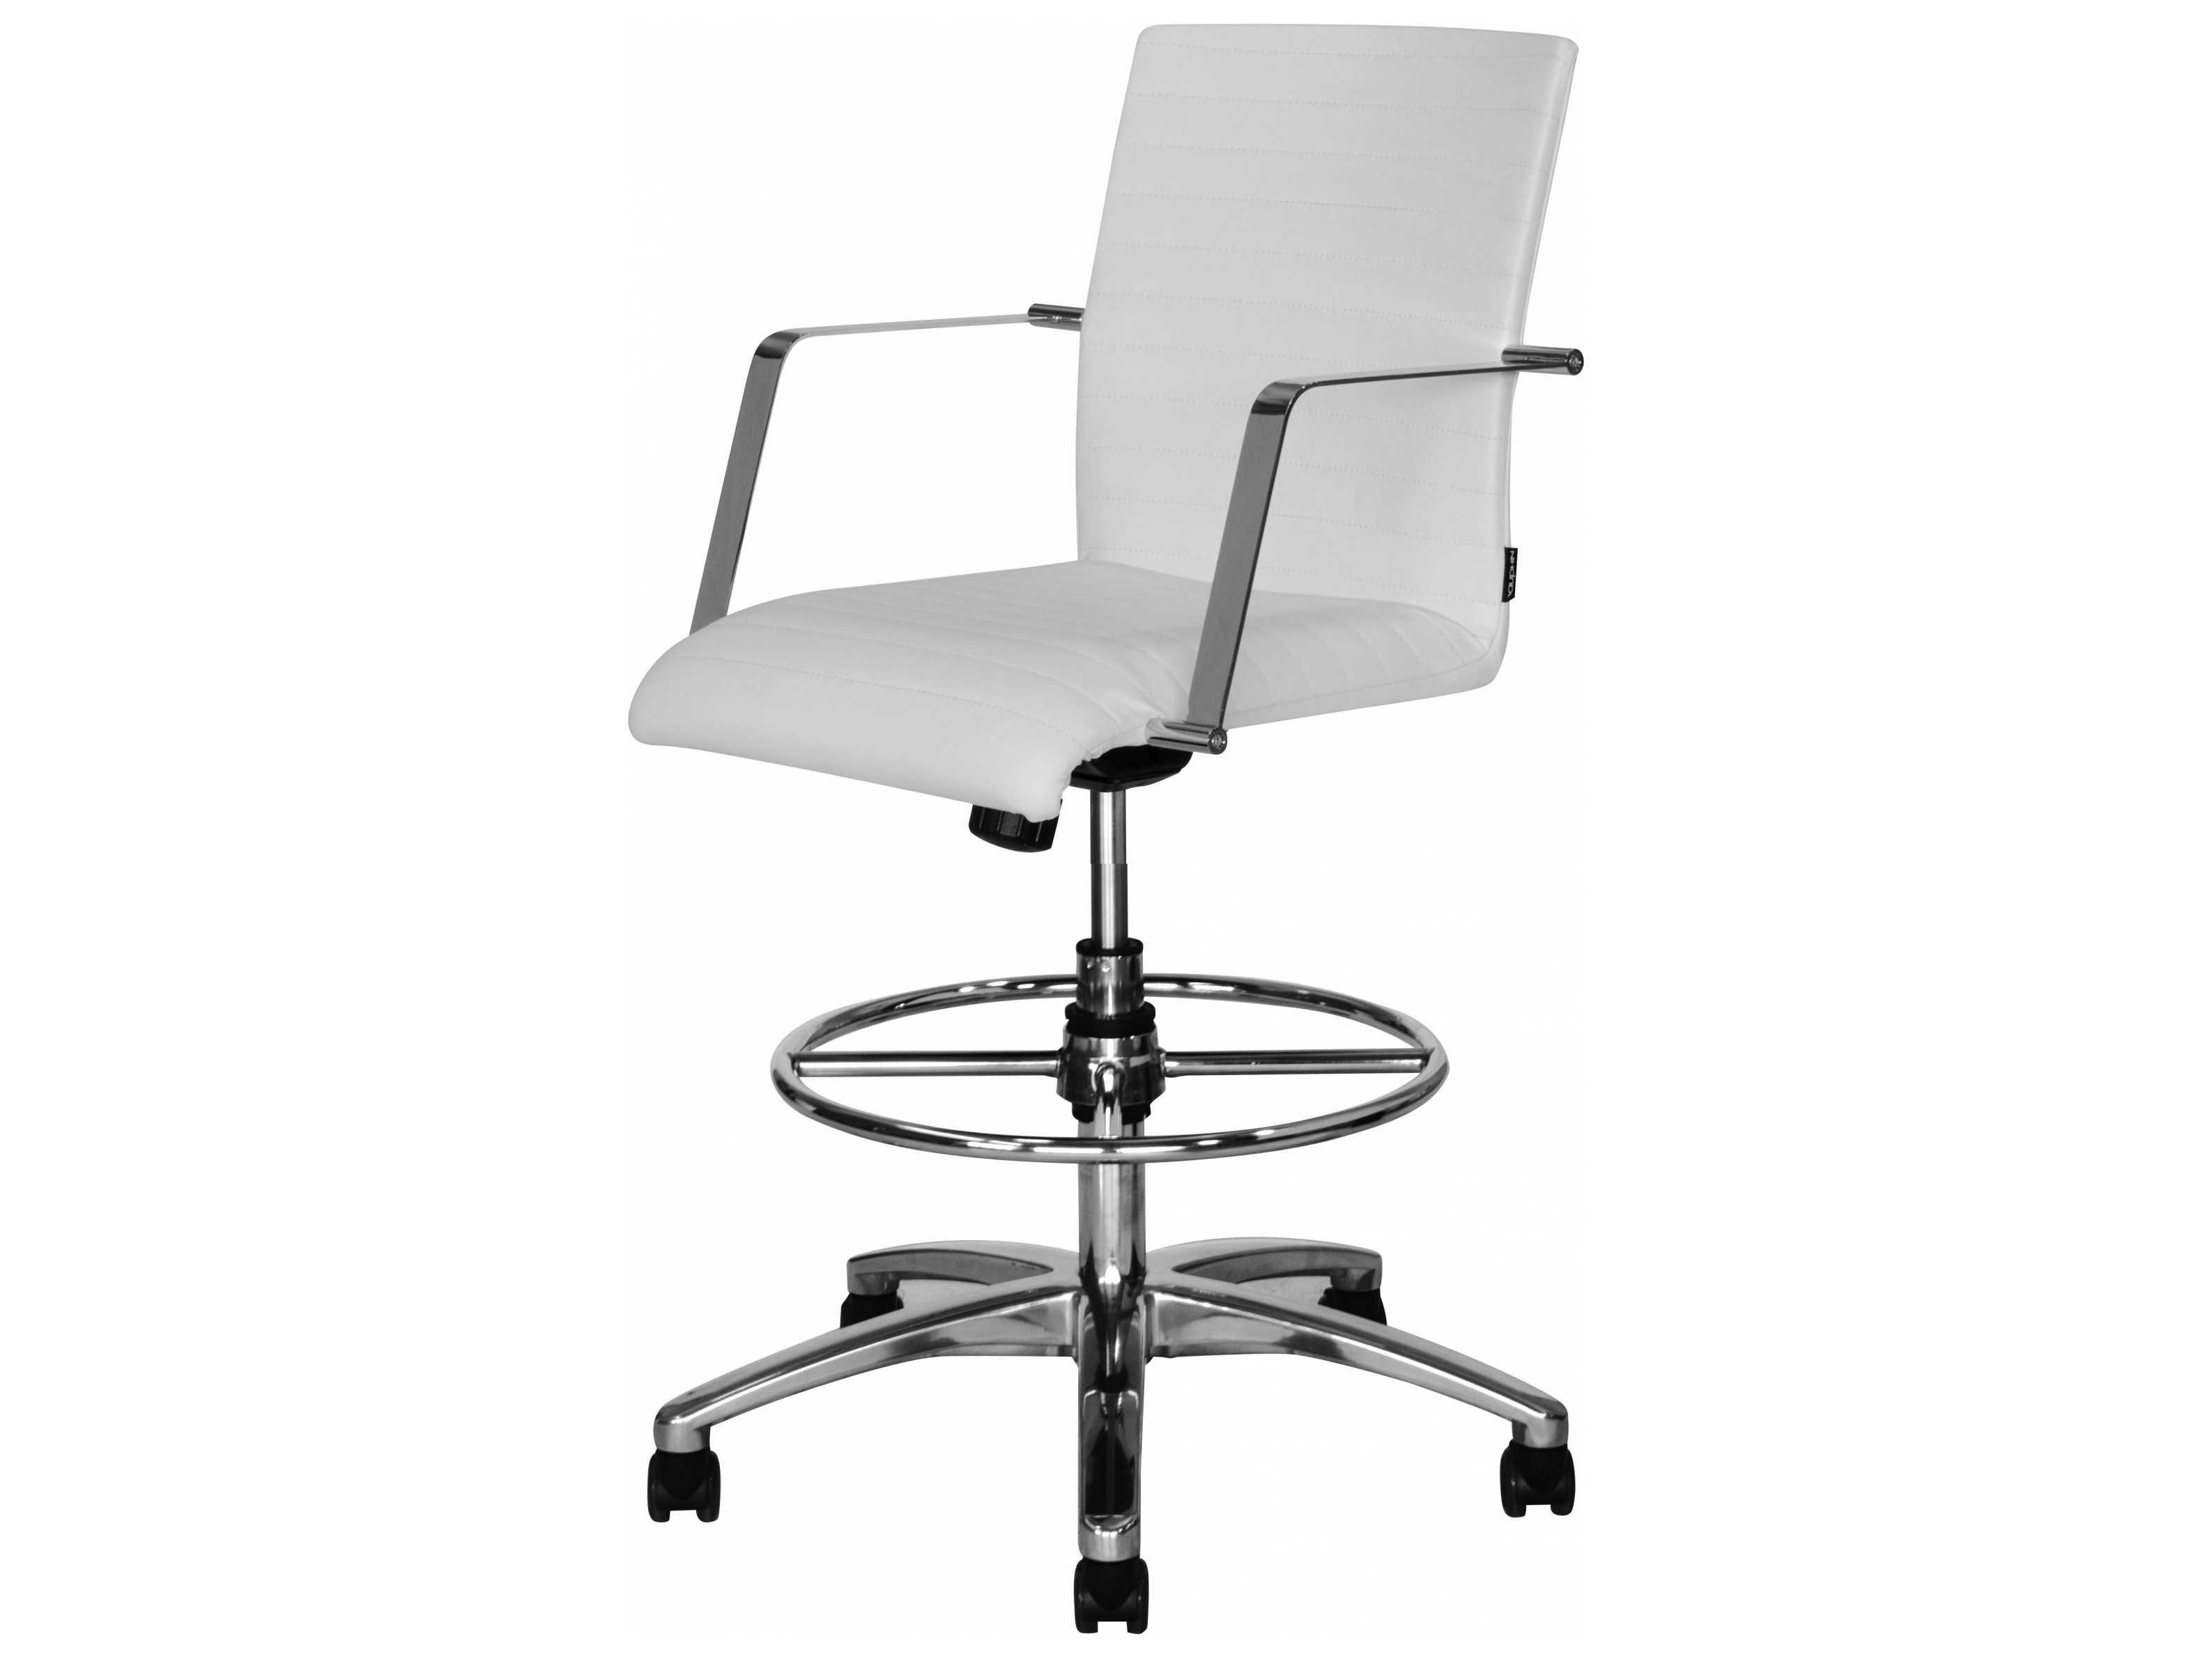 Dauphin Siamo Swivel Tilt Tall Desk Chair Dausm16680t